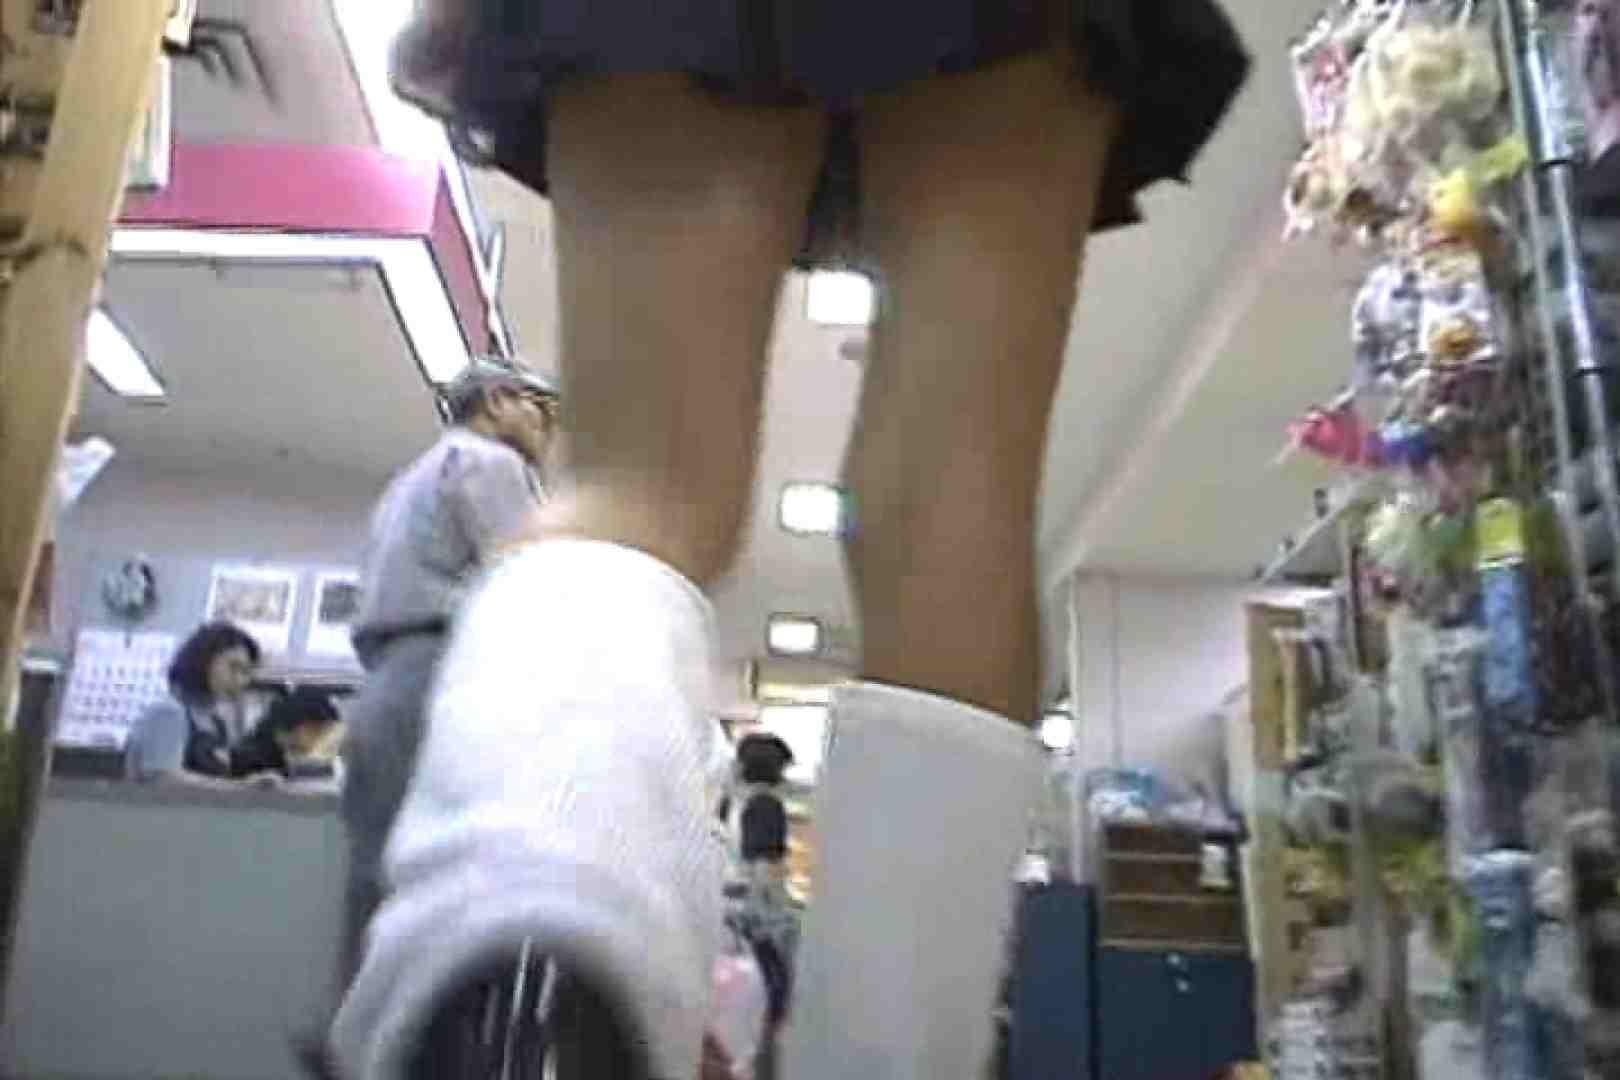 パンチラ局部接写!低空飛行Vol.13 OLヌード天国 盗撮動画紹介 110PIX 50